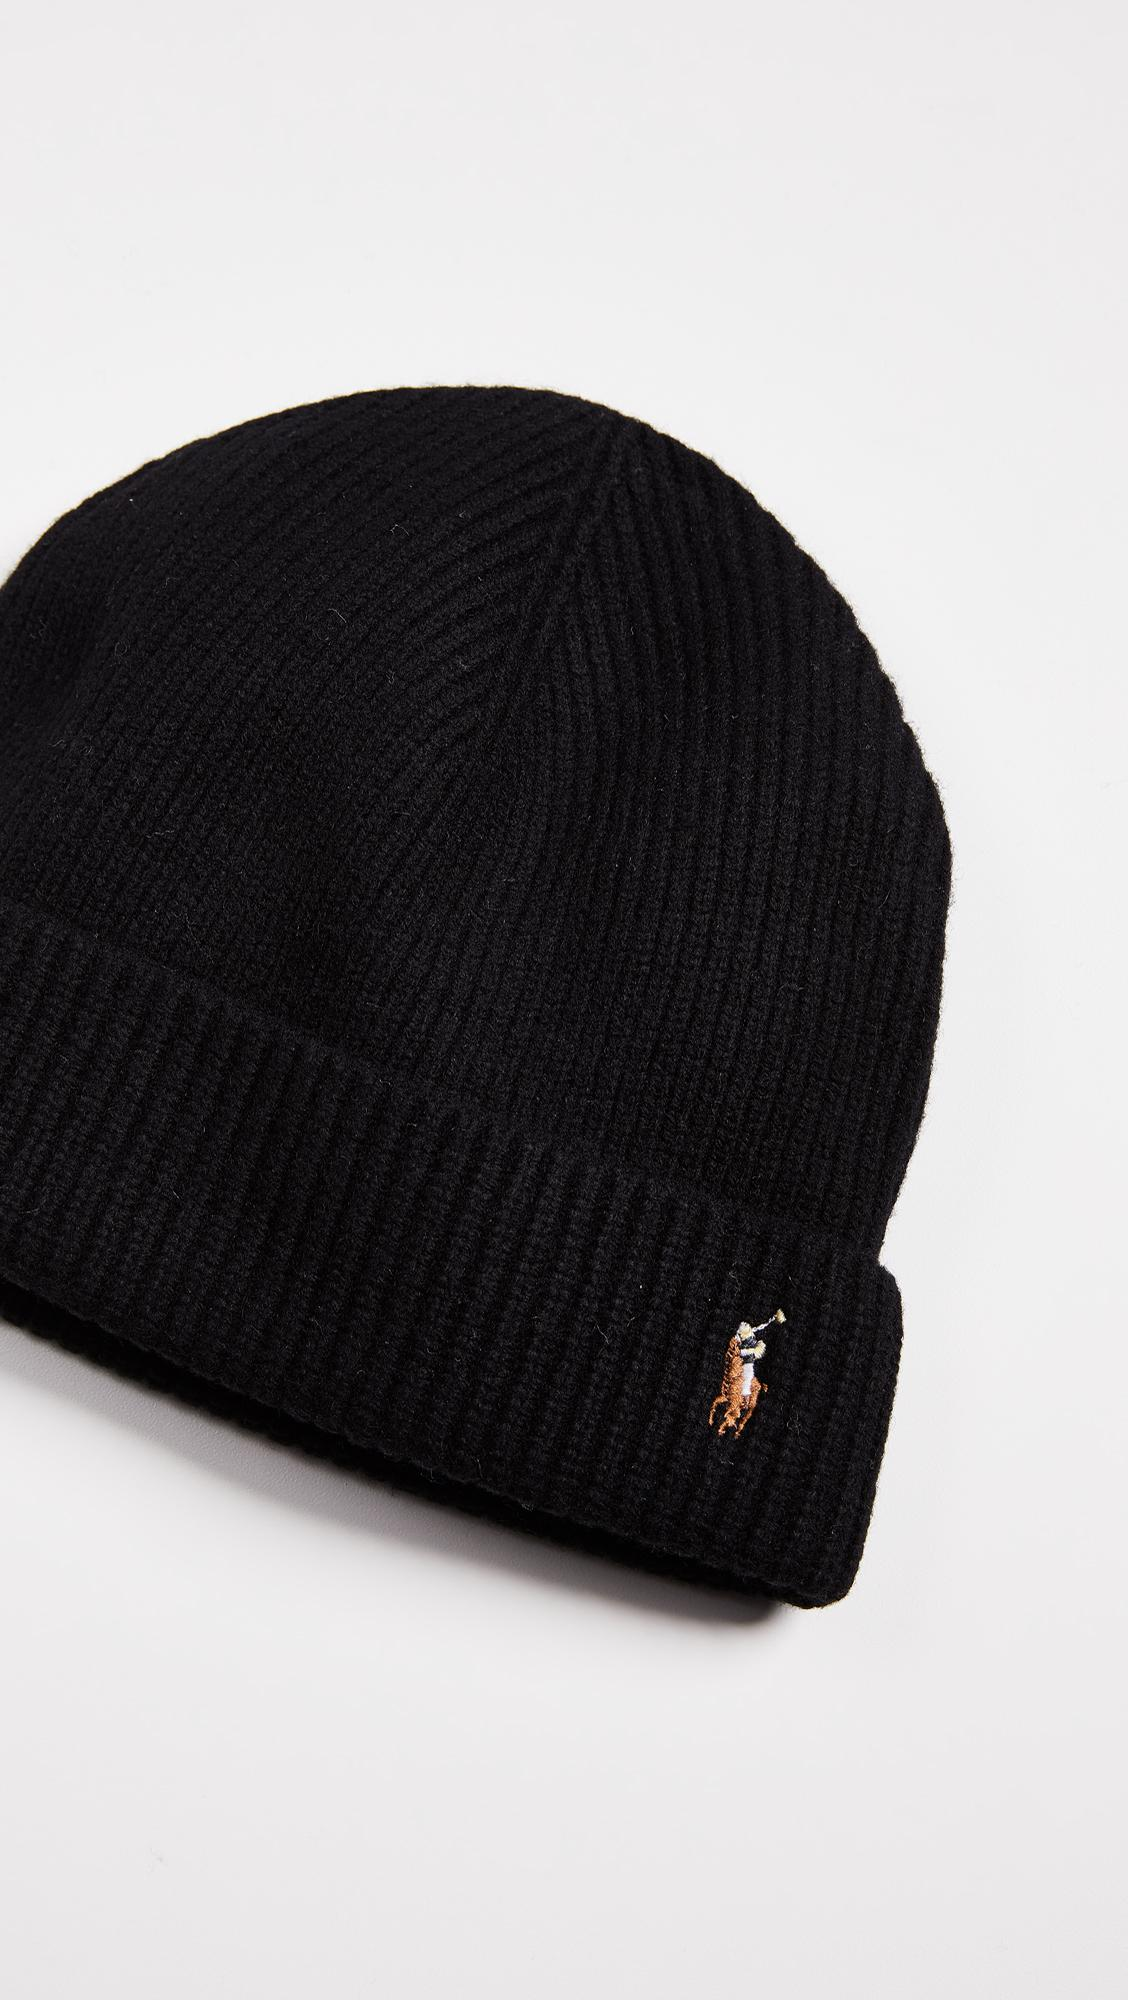 Lyst - Polo Ralph Lauren Signature Merino Cuff Hat in Black for Men dc99f2c7f22